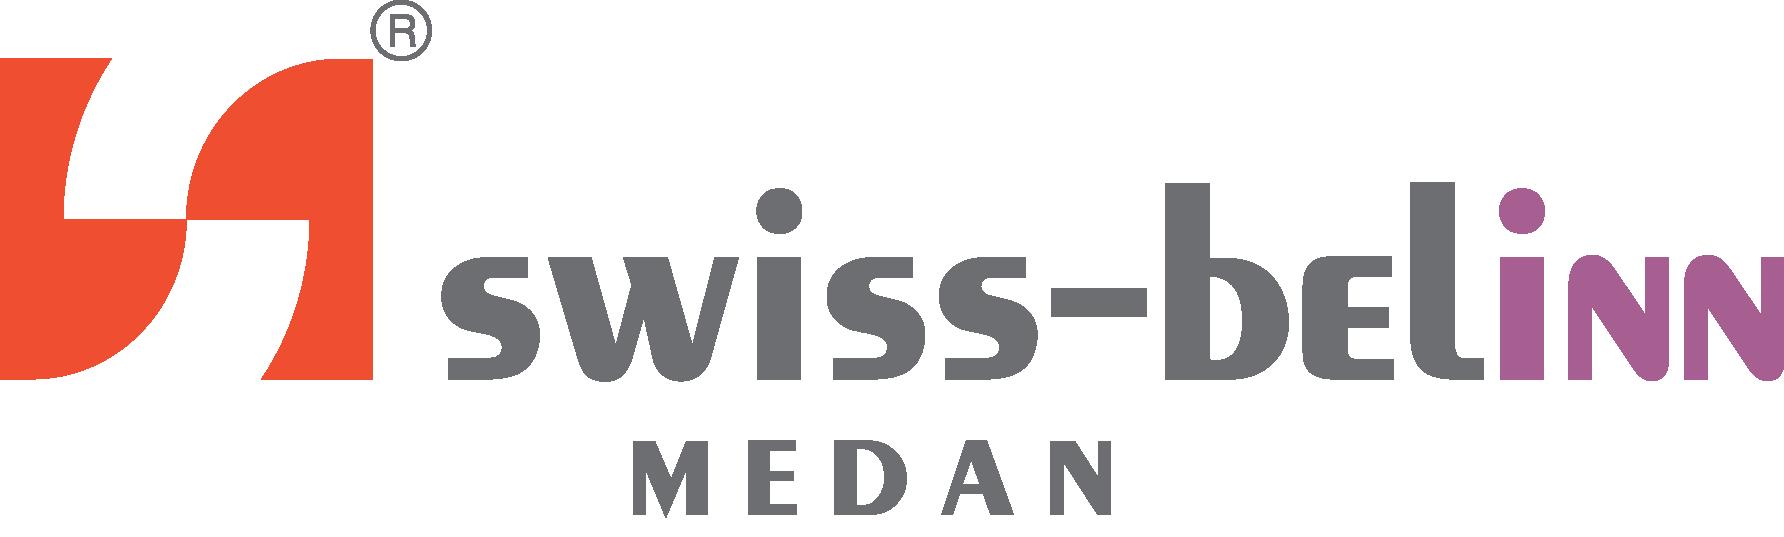 Kesawan Square Swiss Belinn Medan Kota